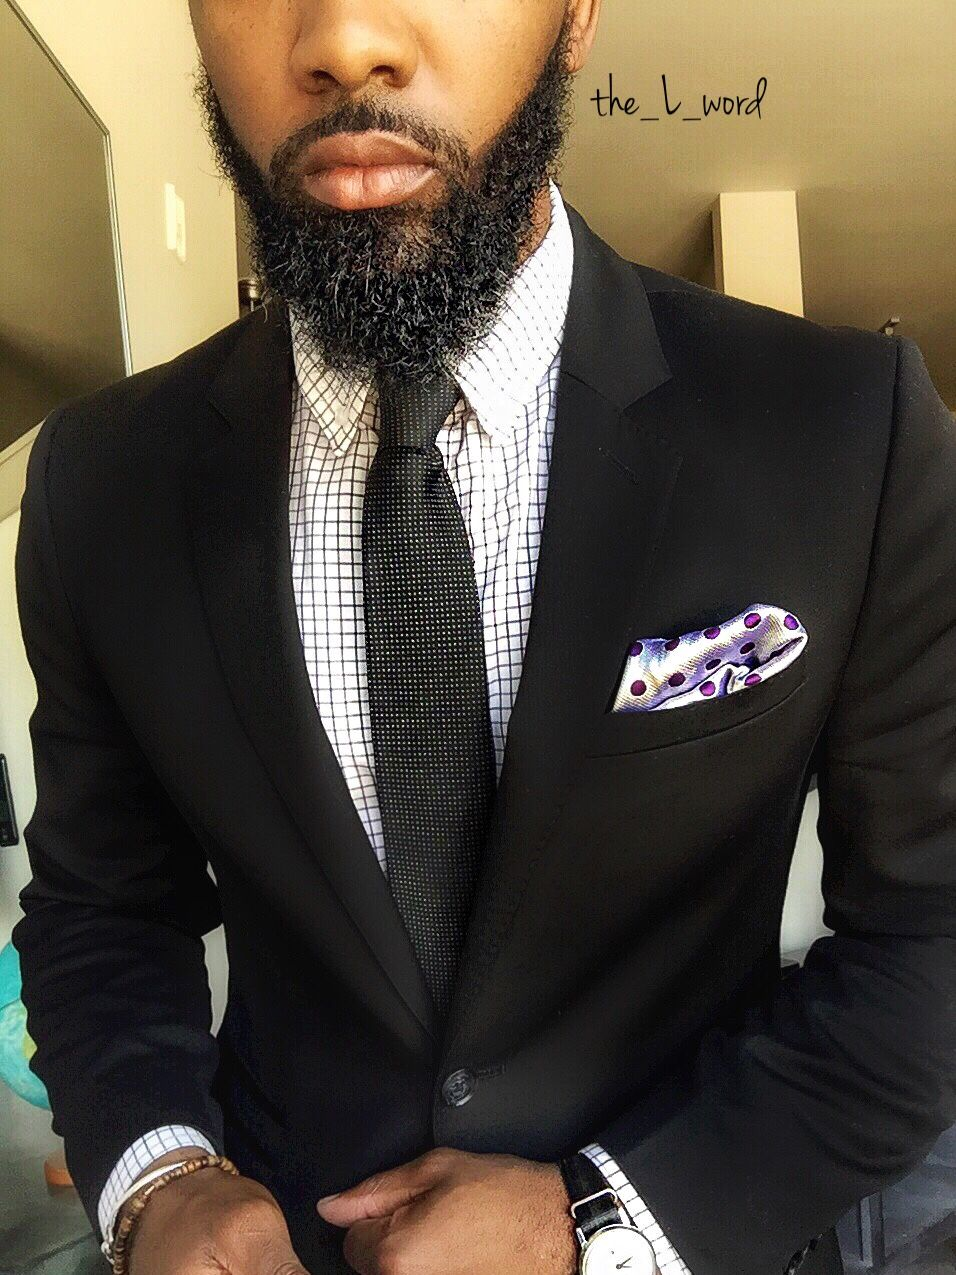 Black Fashion Black Suit Checkered Shirt Polka Dot Pocket Piece Black Beards Fashion Black Fashion [ 1275 x 956 Pixel ]